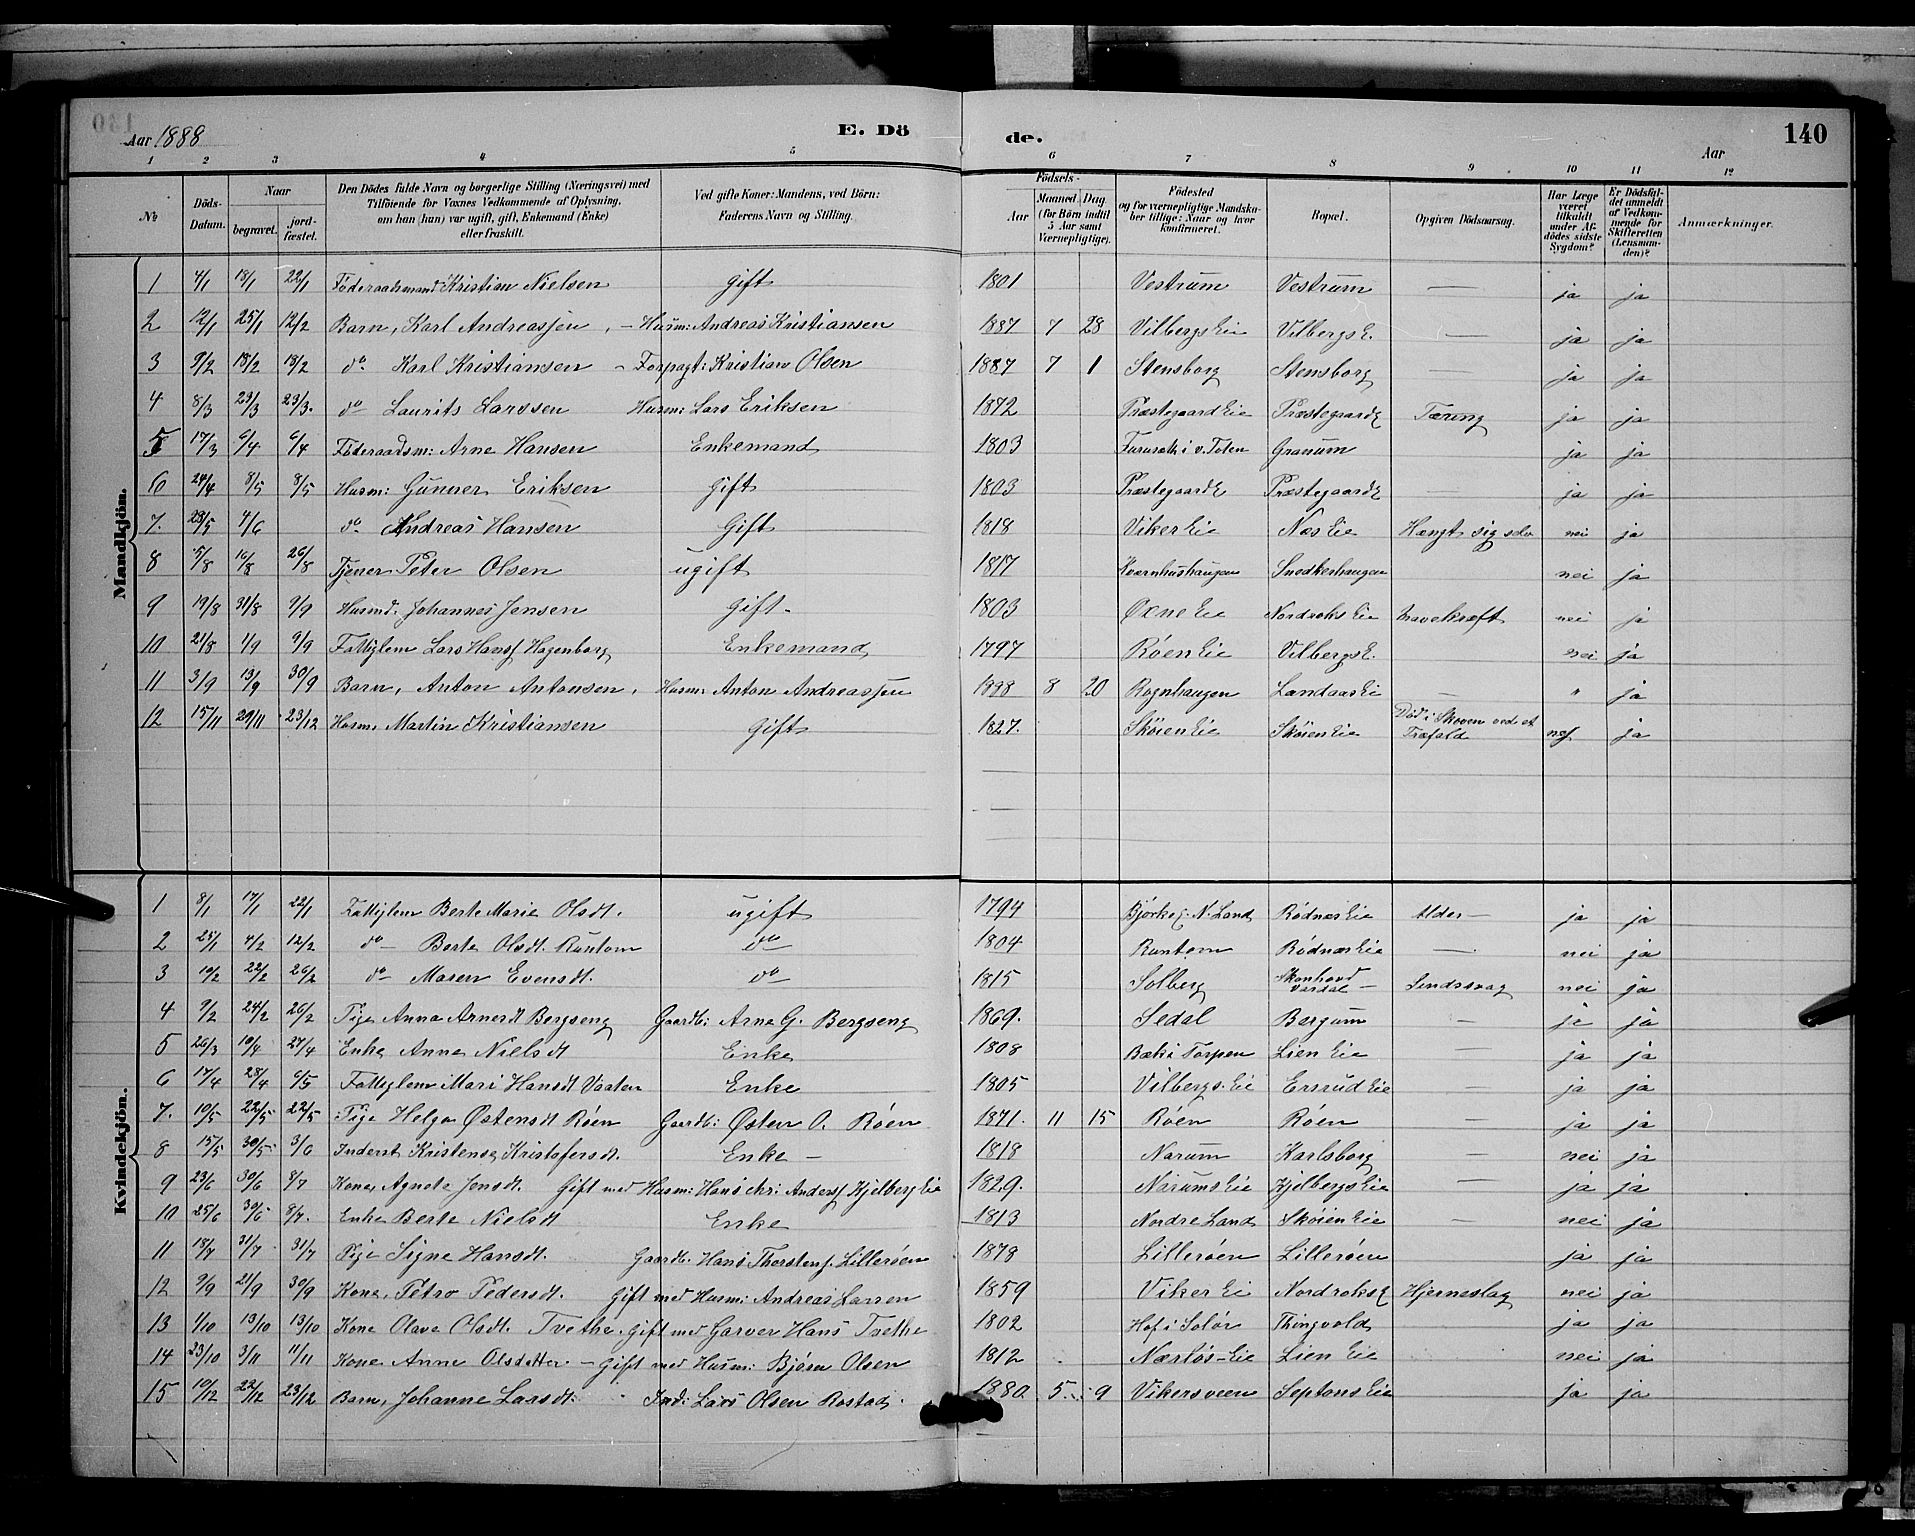 SAH, Søndre Land prestekontor, L/L0003: Klokkerbok nr. 3, 1884-1902, s. 140